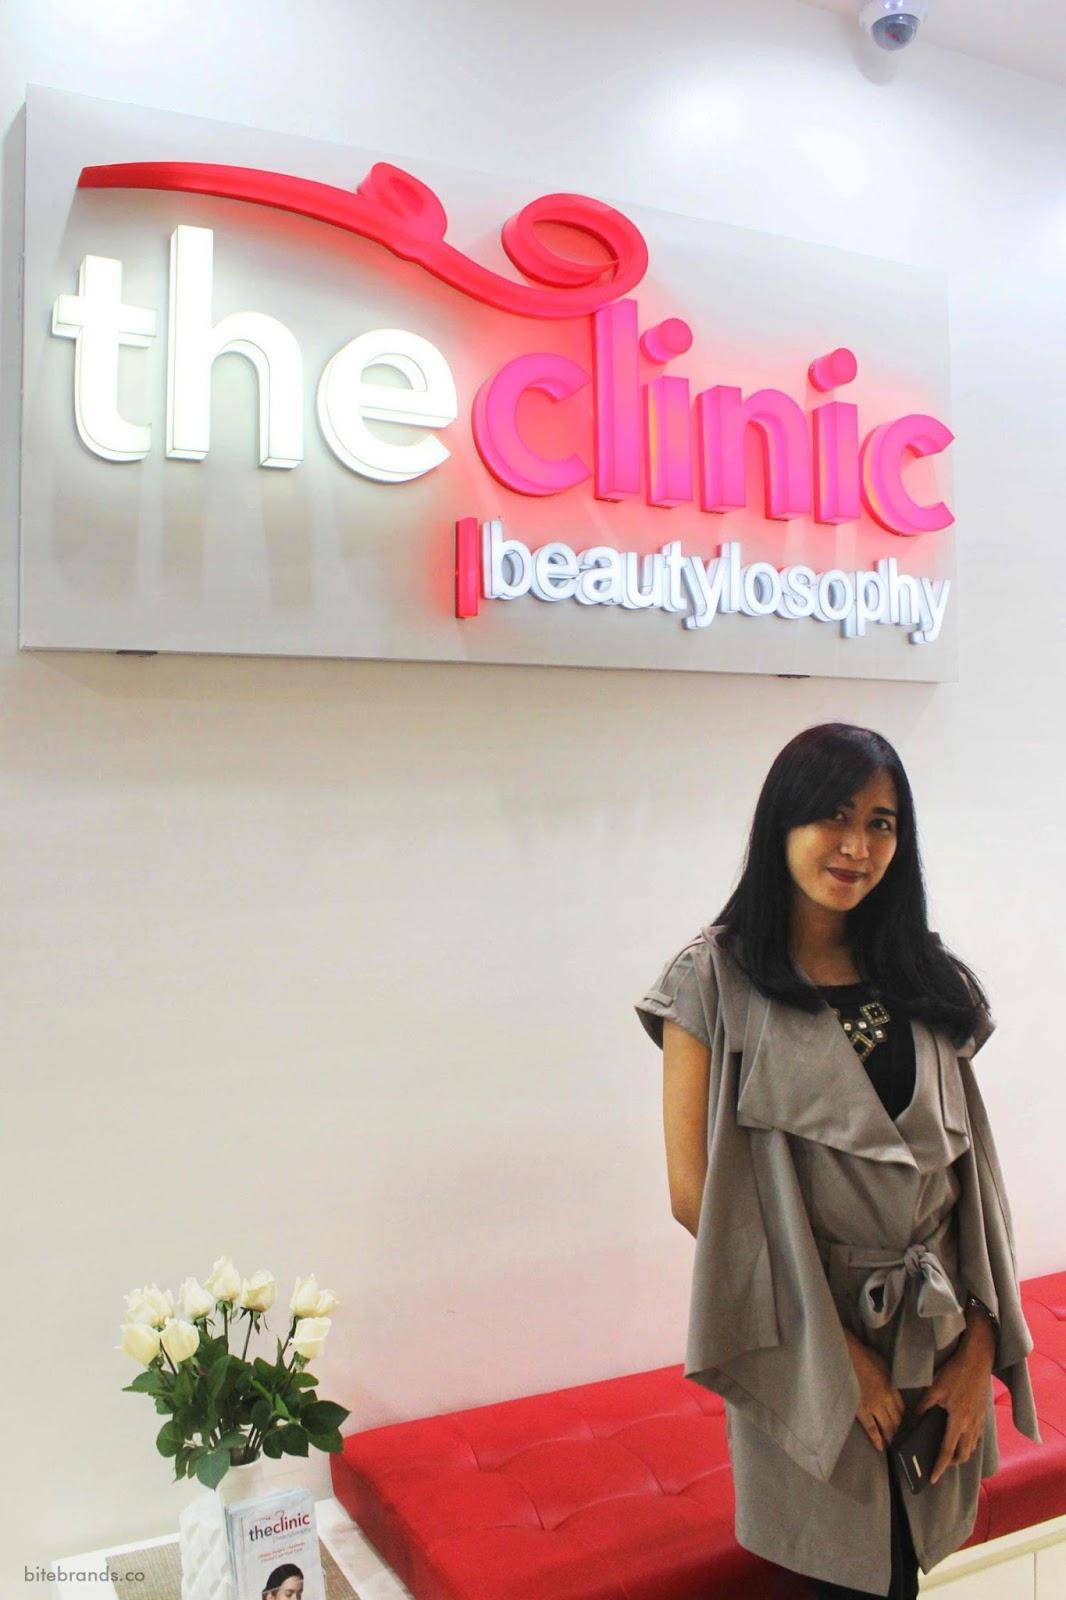 klinik kecantikan skincare laser wajah beauty clinic blogger vlogger indonesia terbaik pilihan favorit recommended liputan bisnis dokter estetika aman bahan alami krim menghilangkan jerawat kulit mulus anti aging review terapis jakarta beautylosophy produk